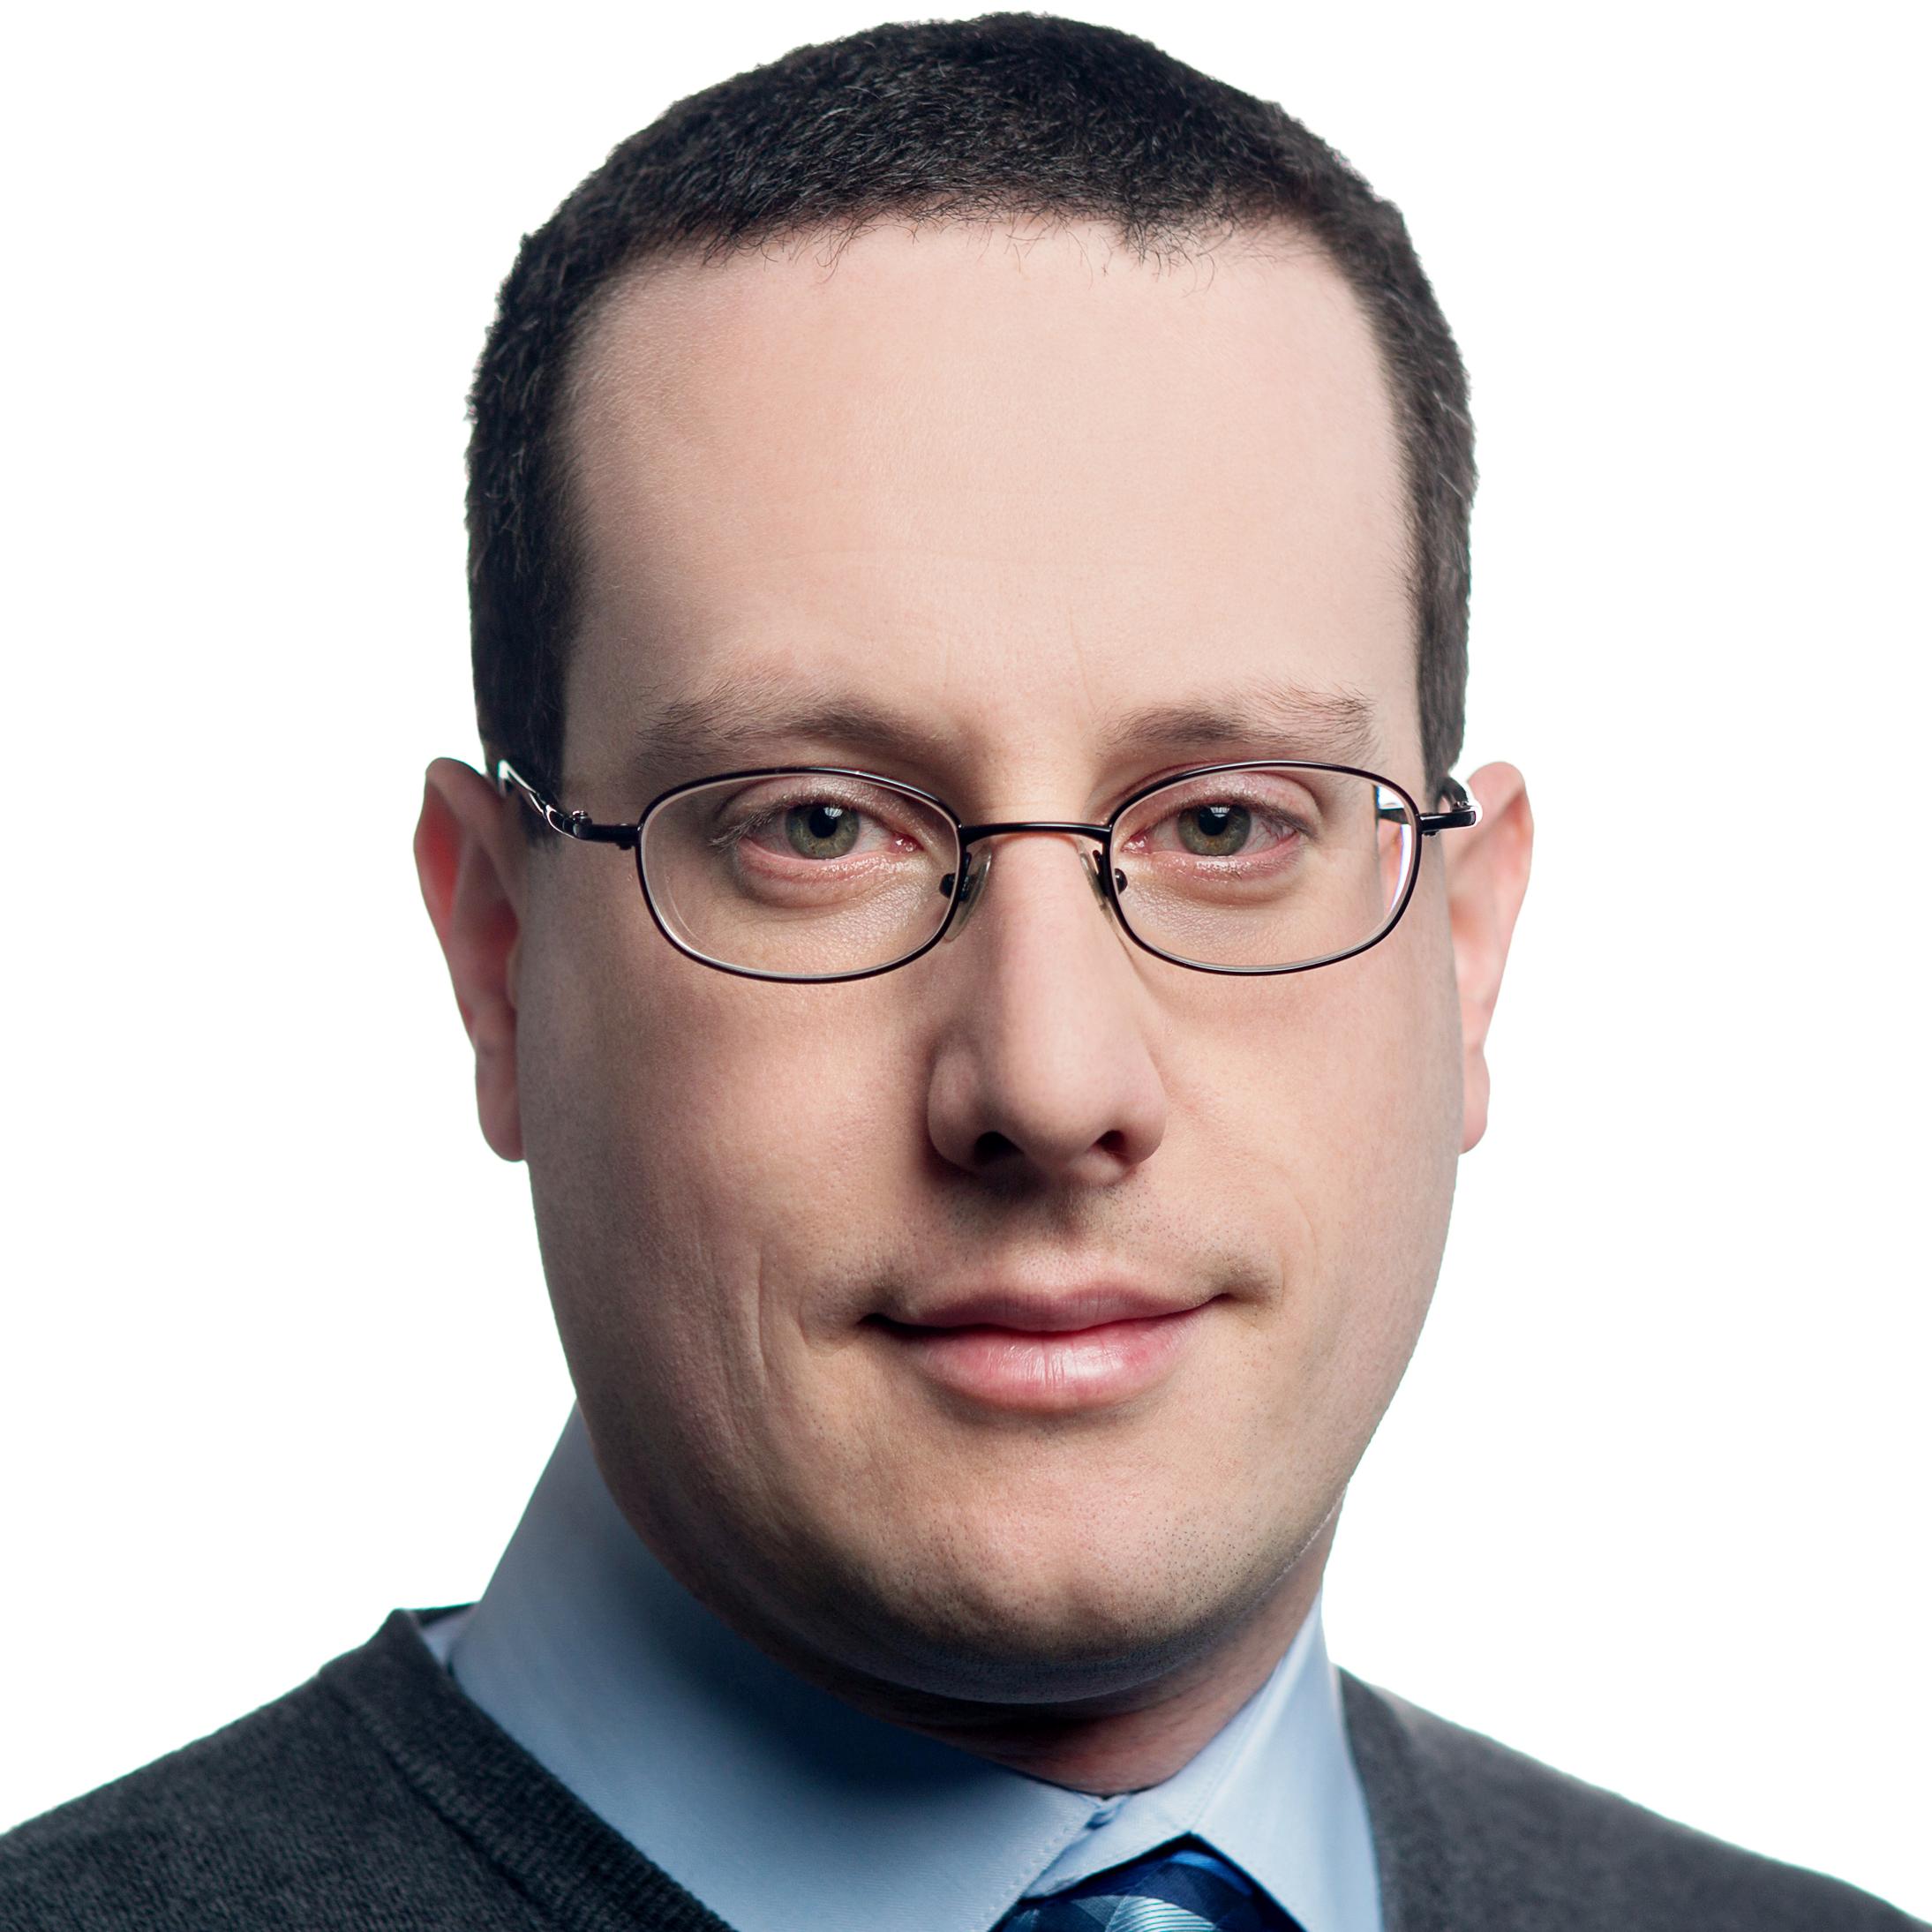 Jonathan Tannenwald